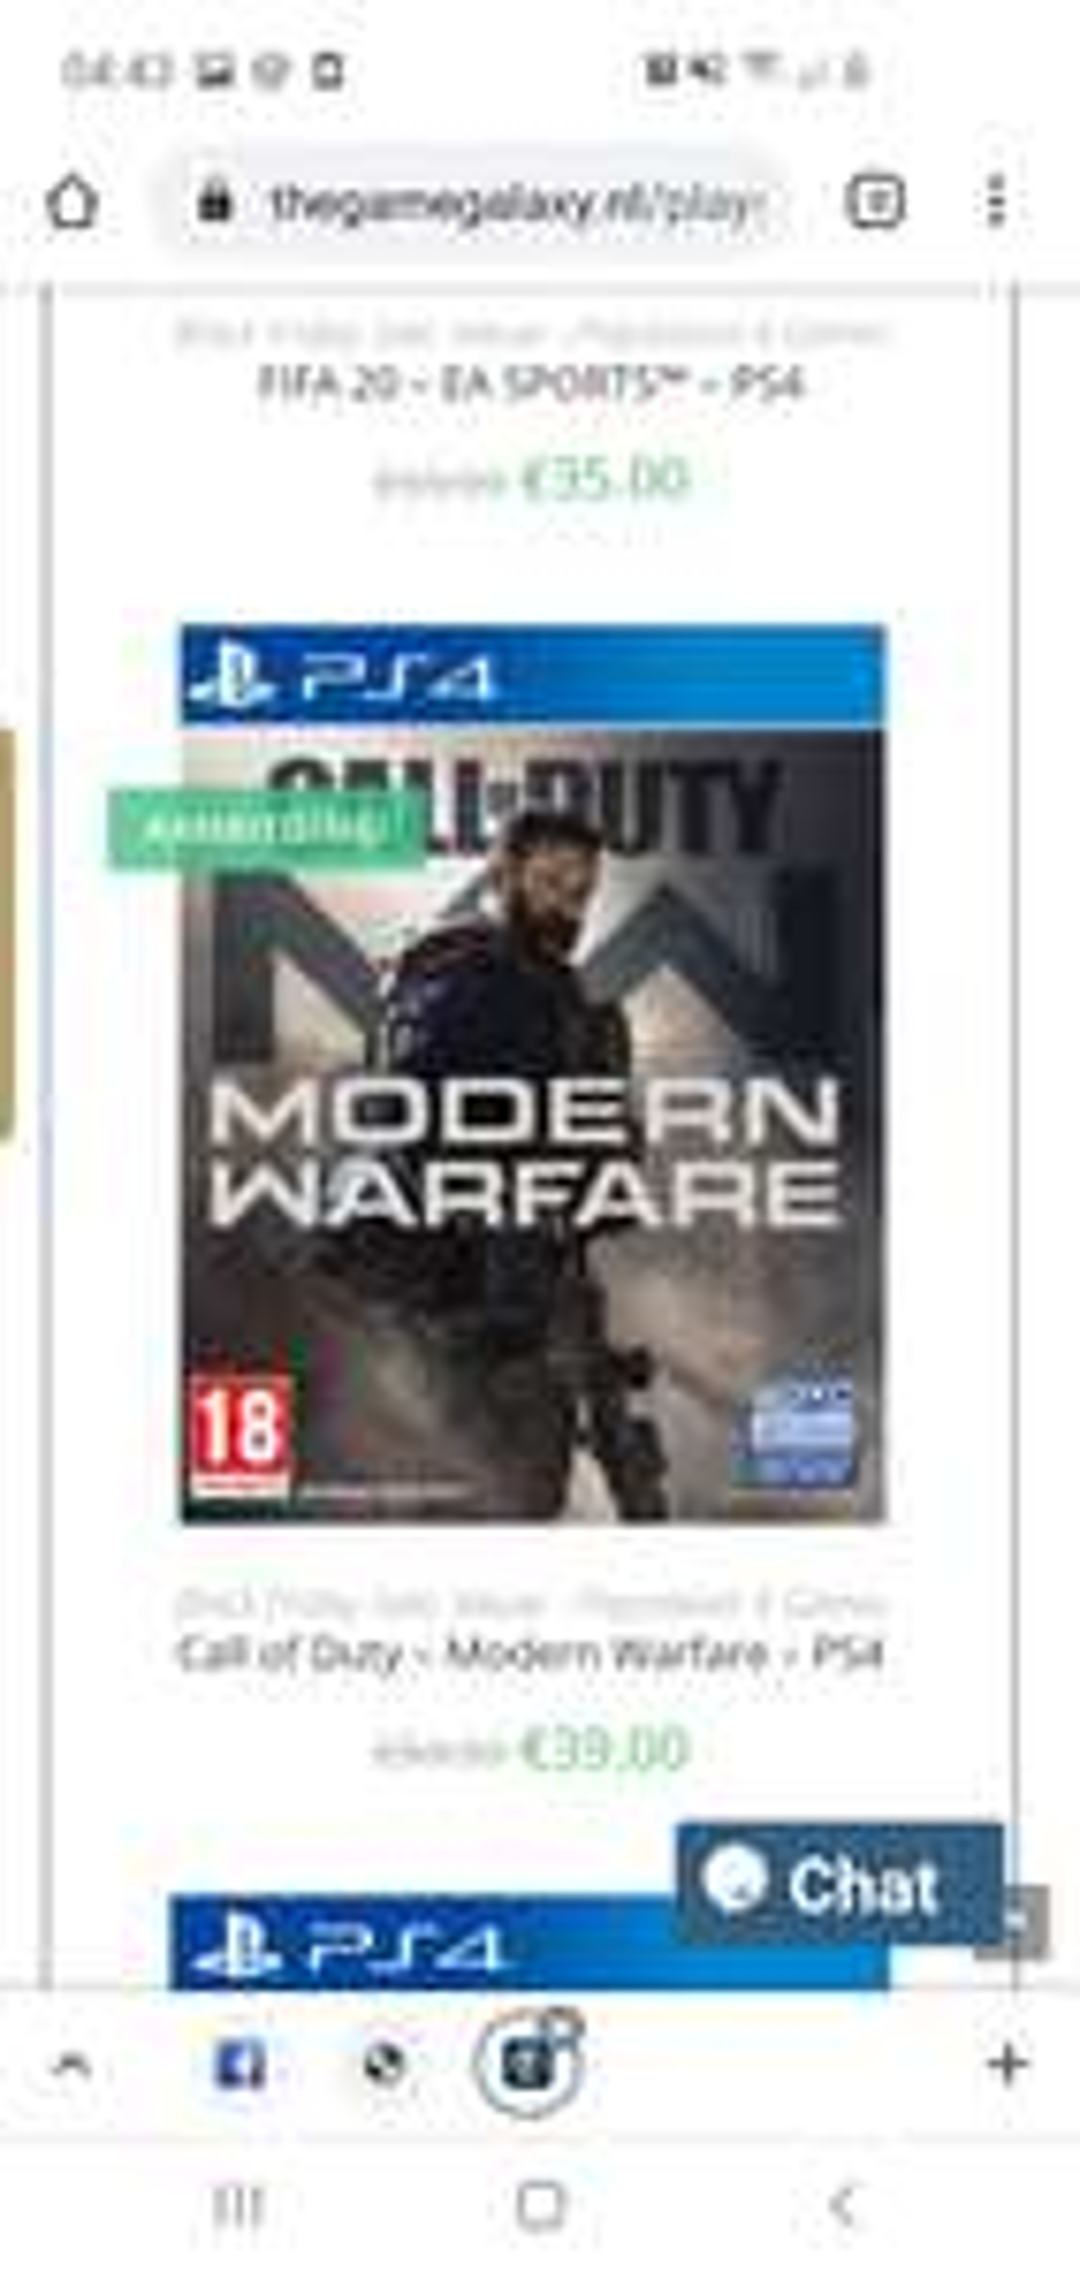 Modern warfare voor de playstation 4